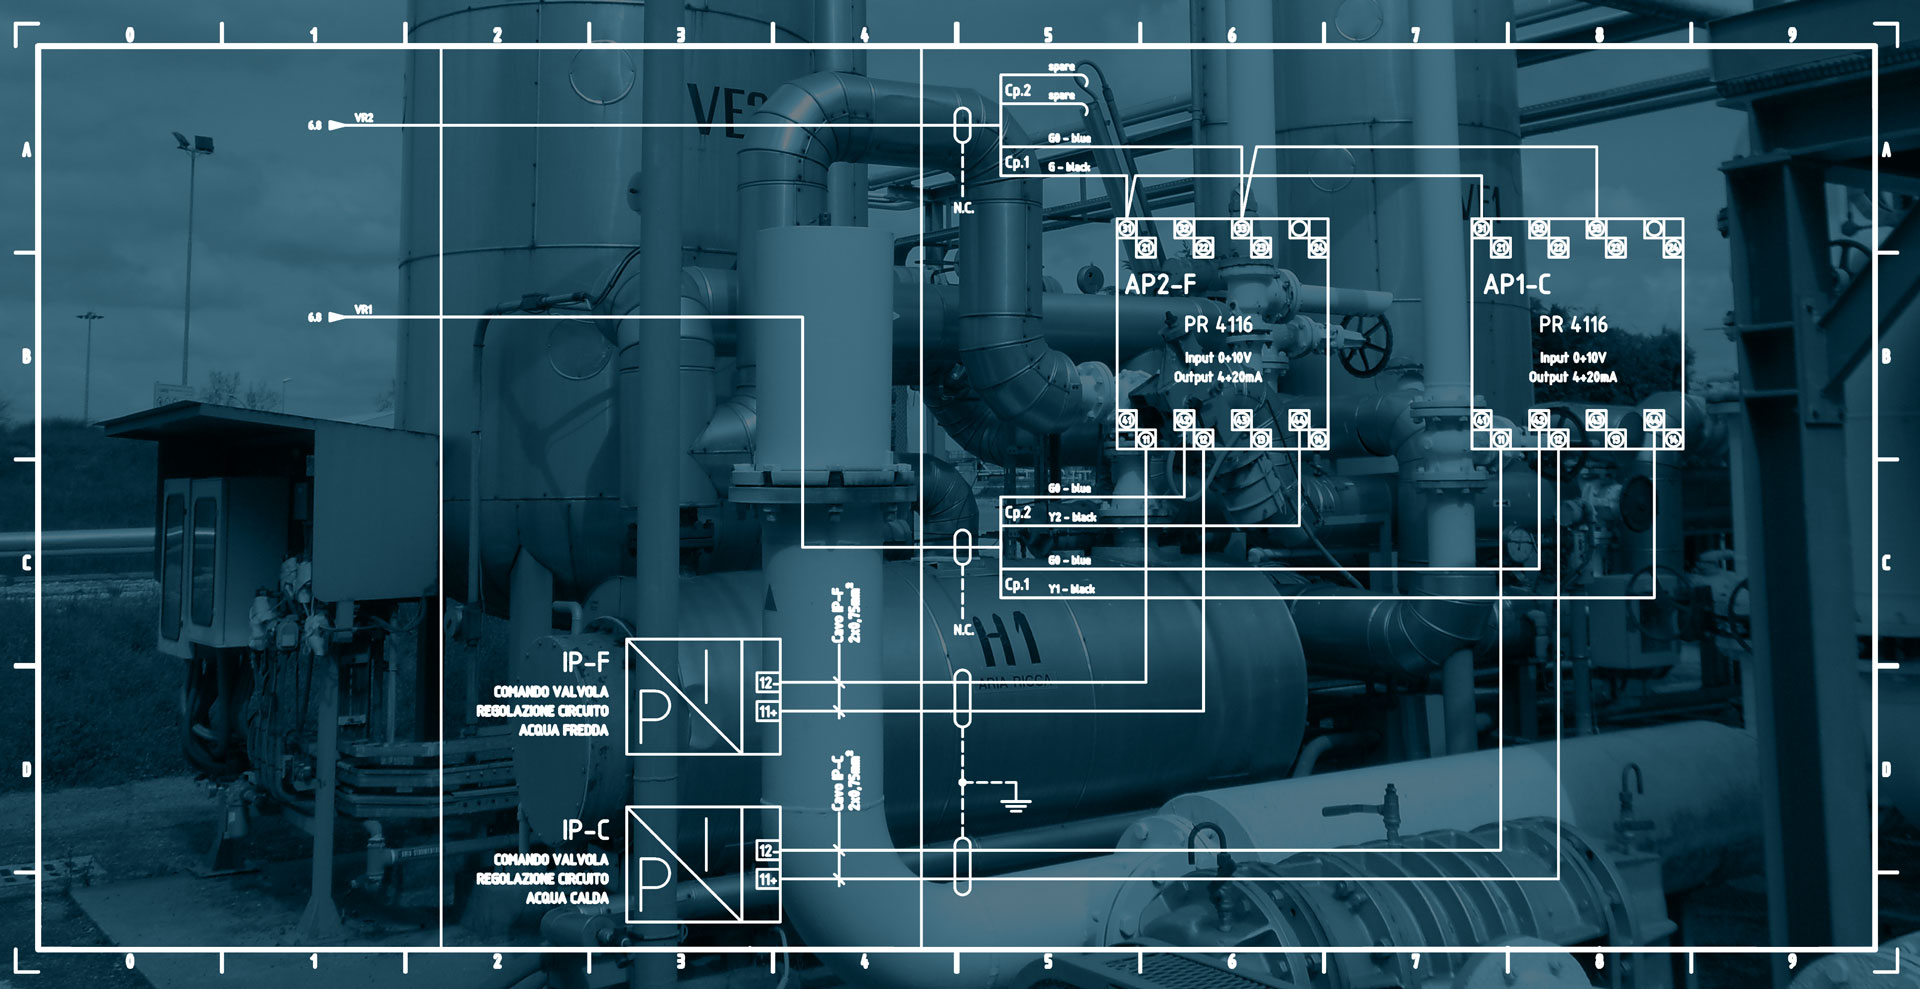 ENGIGNEERING_CONSTRUCTION_QUADRO_ELETTRICO_schema